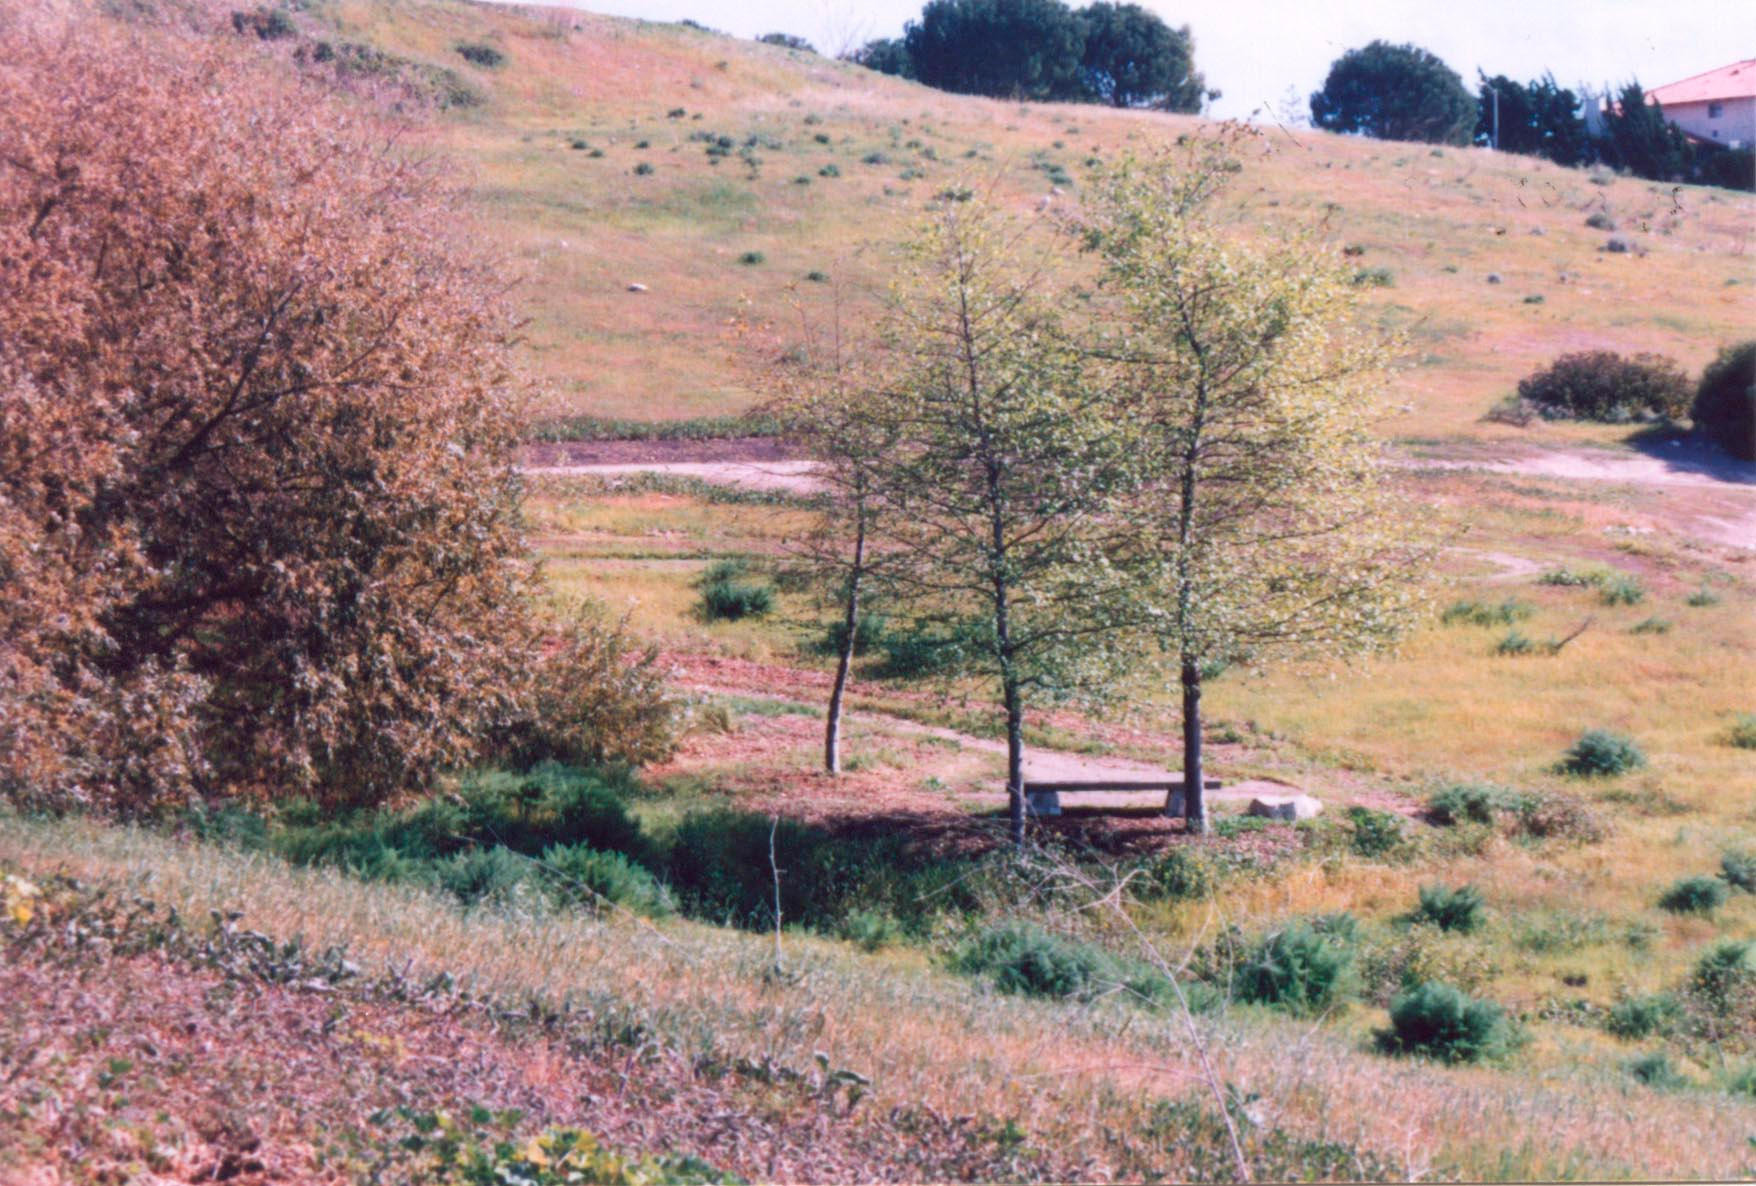 022 Hesse Park-Palos Verdes CA by J2theStock